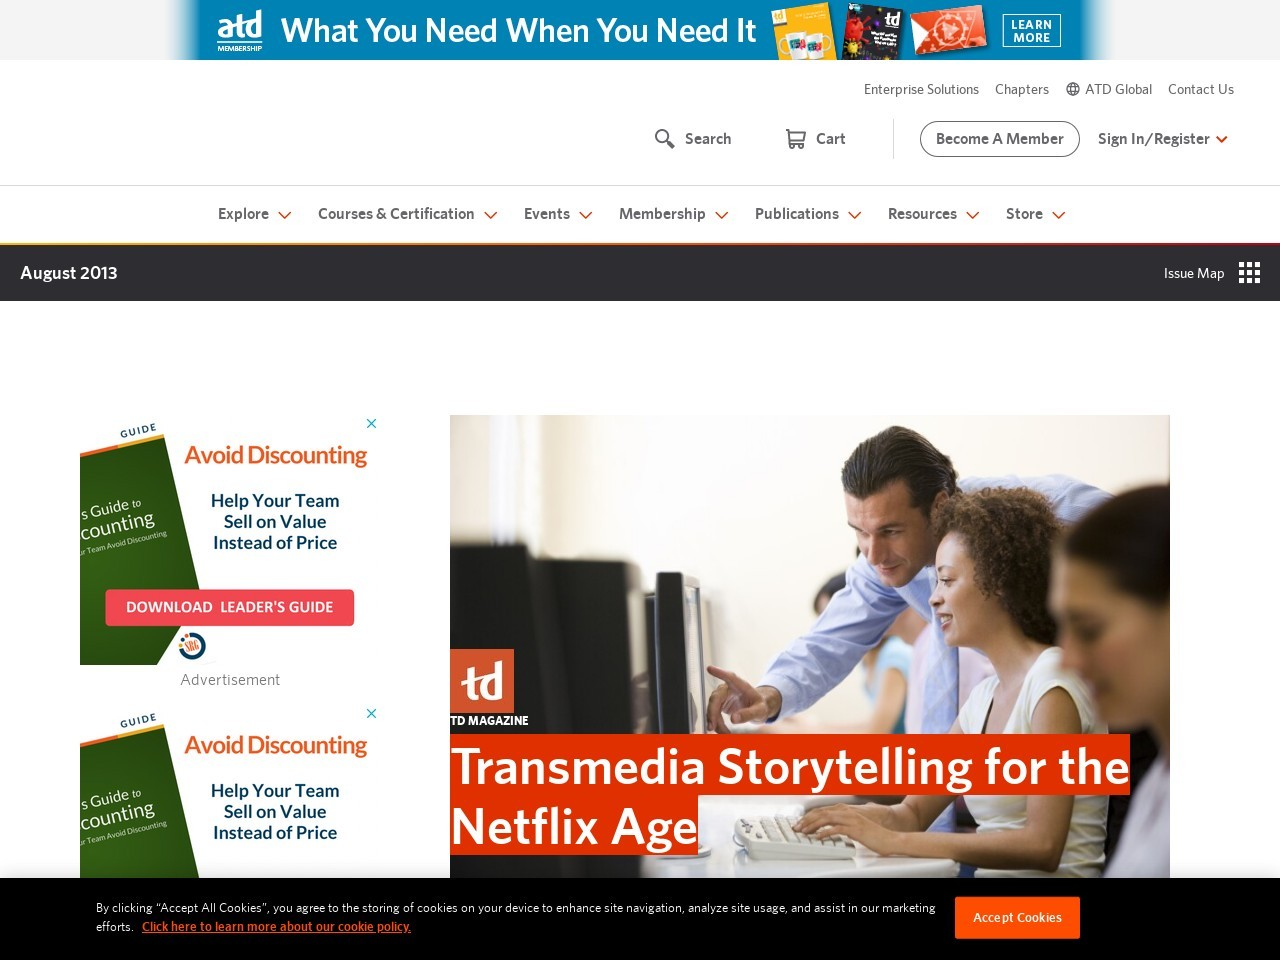 Transmedia Storytelling for the Netflix Age